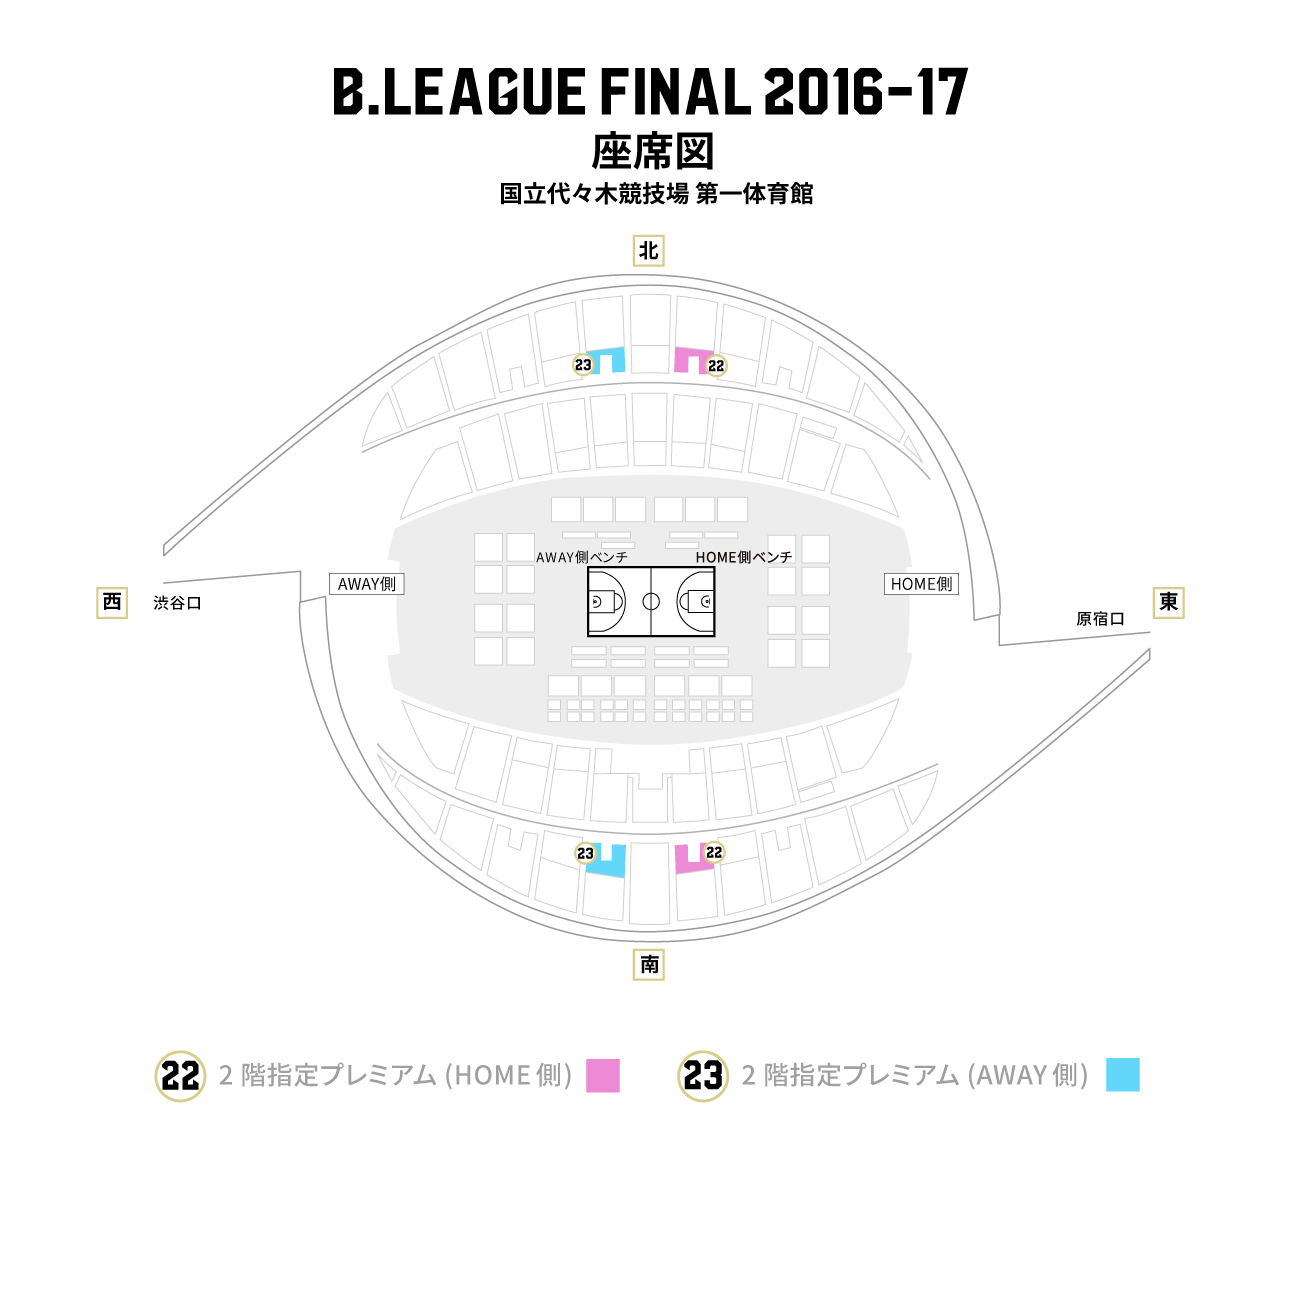 seatview_final_seat_22_23.jpg